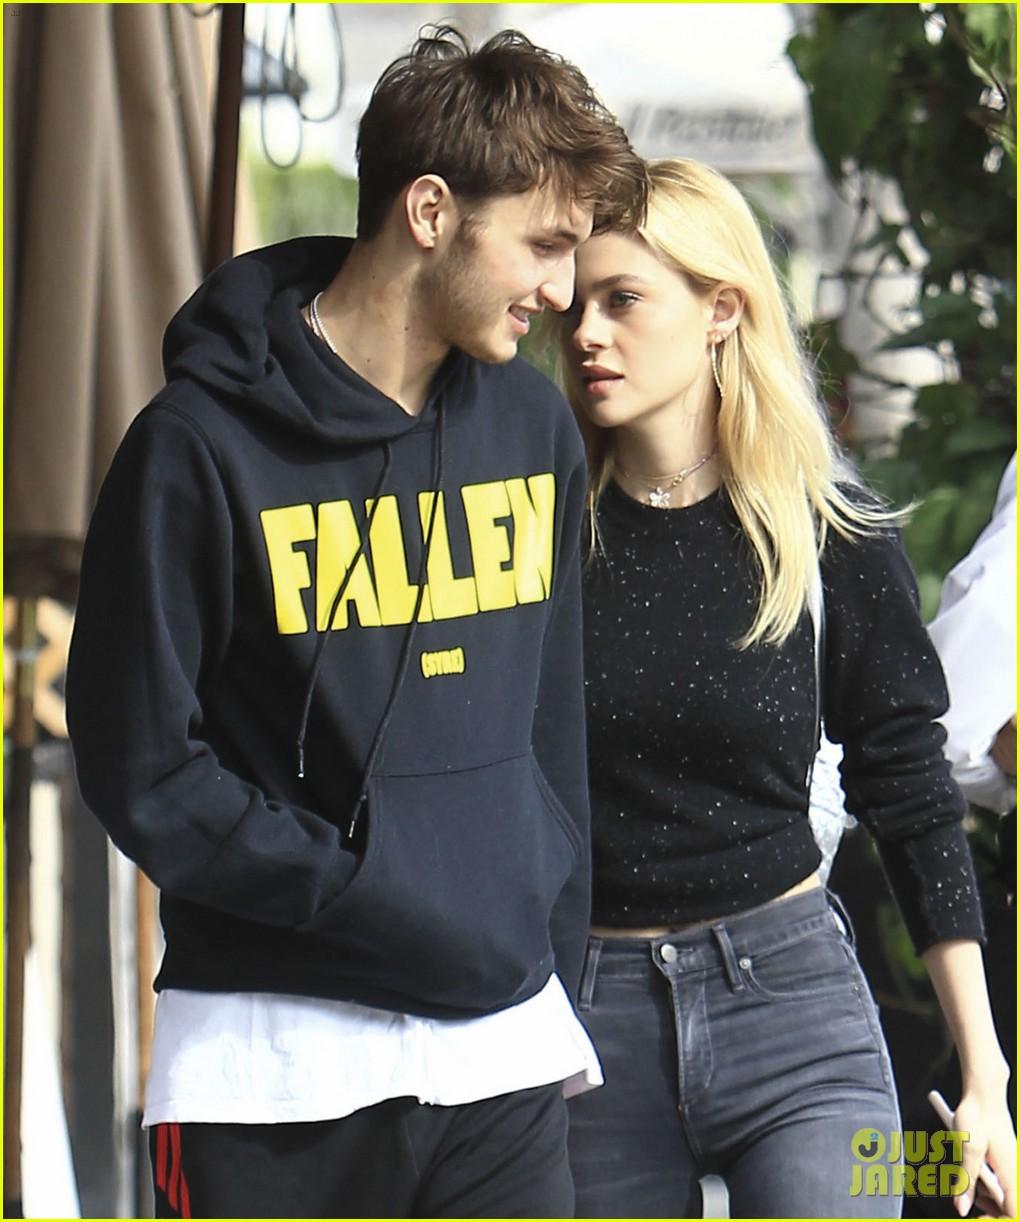 Nicola peltz dating